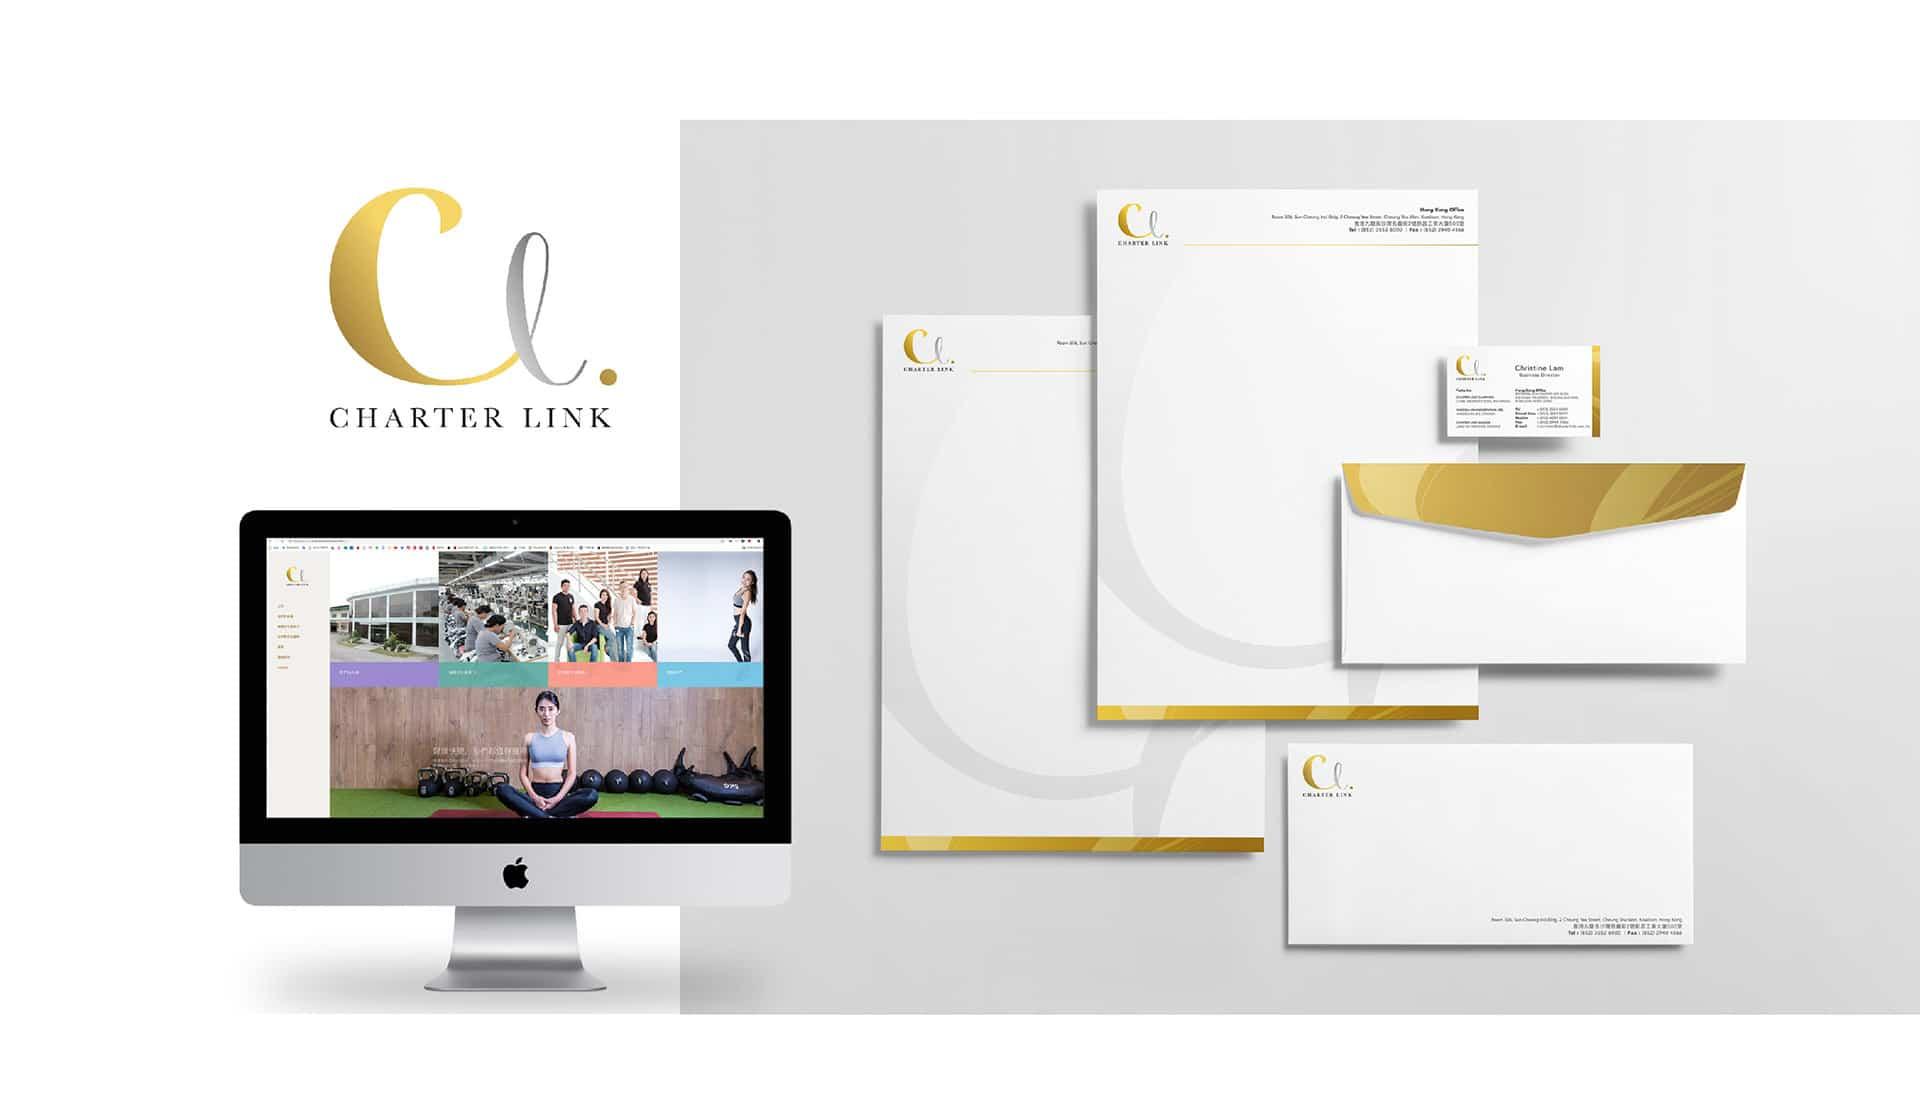 Charter Link|Company Profile, Branding & Website Design